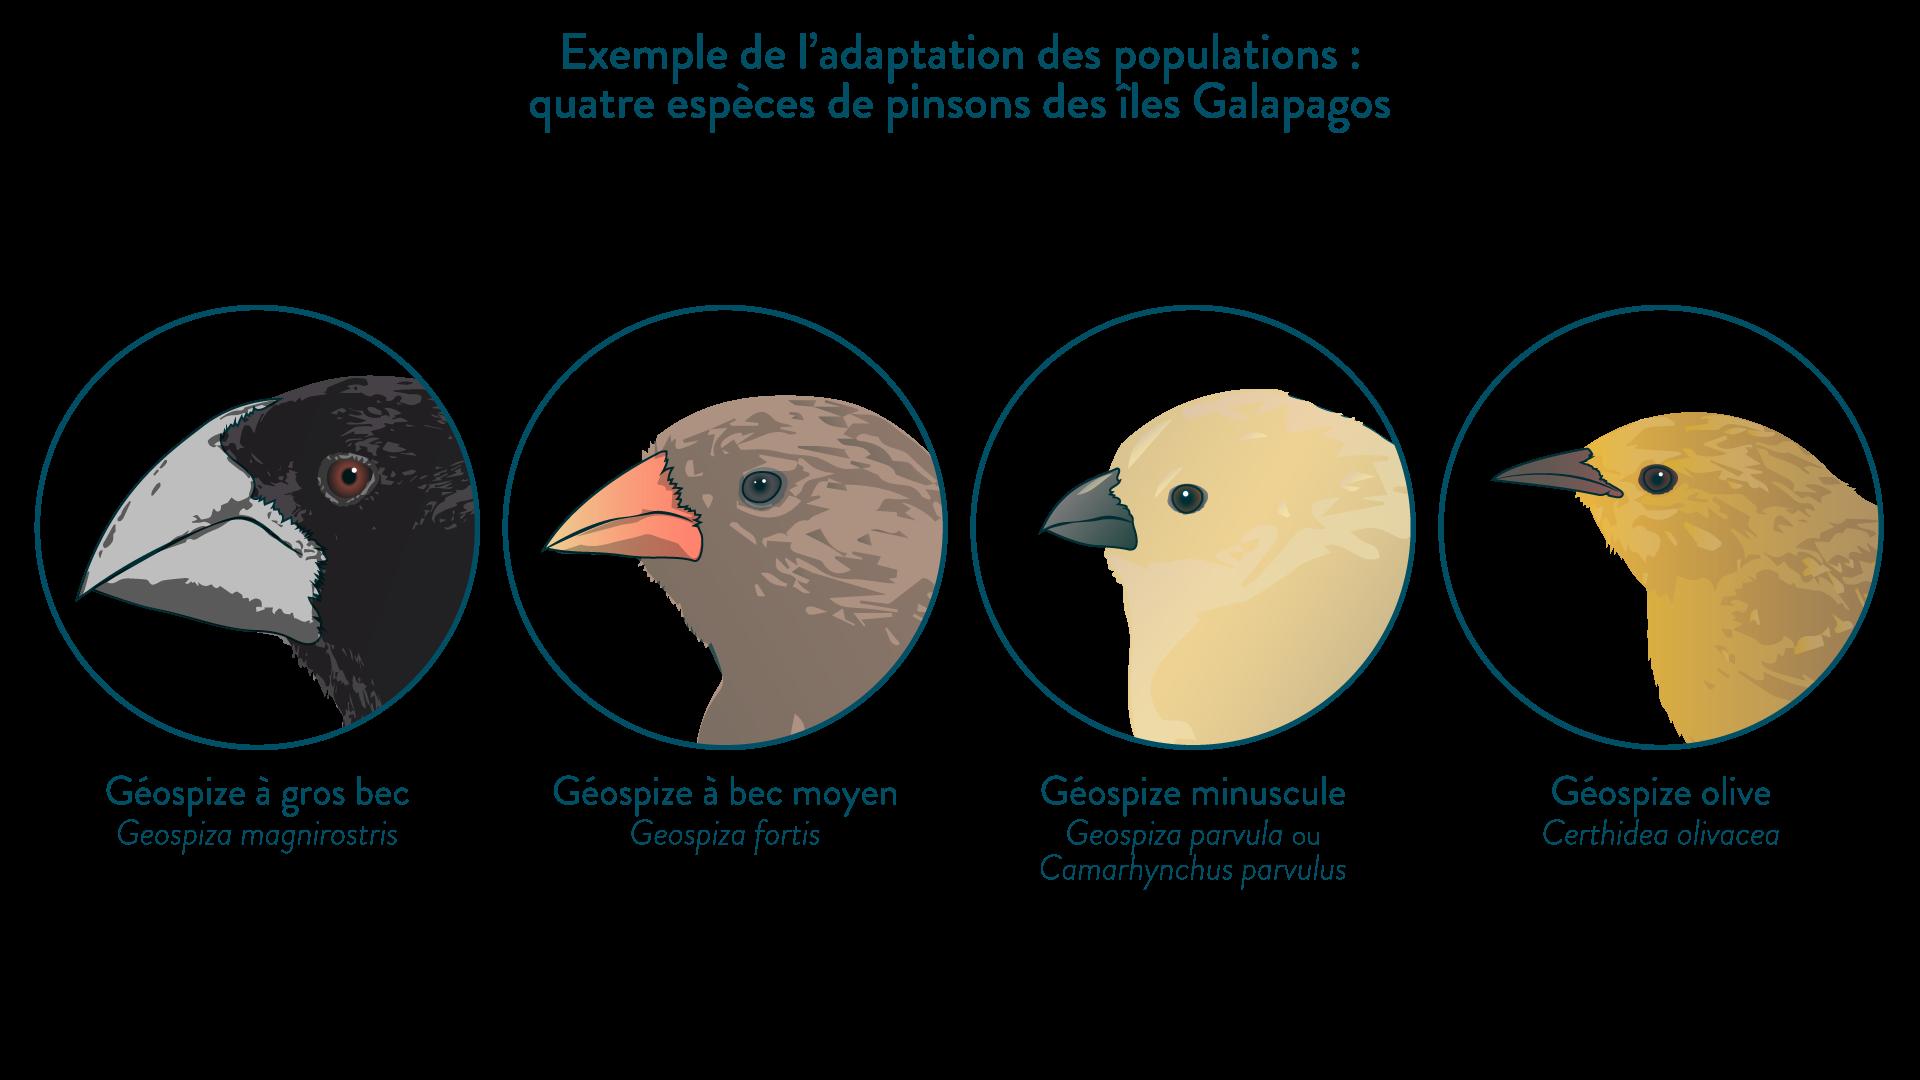 Exemples de quatre espèces de pinsons des îles Galápagos